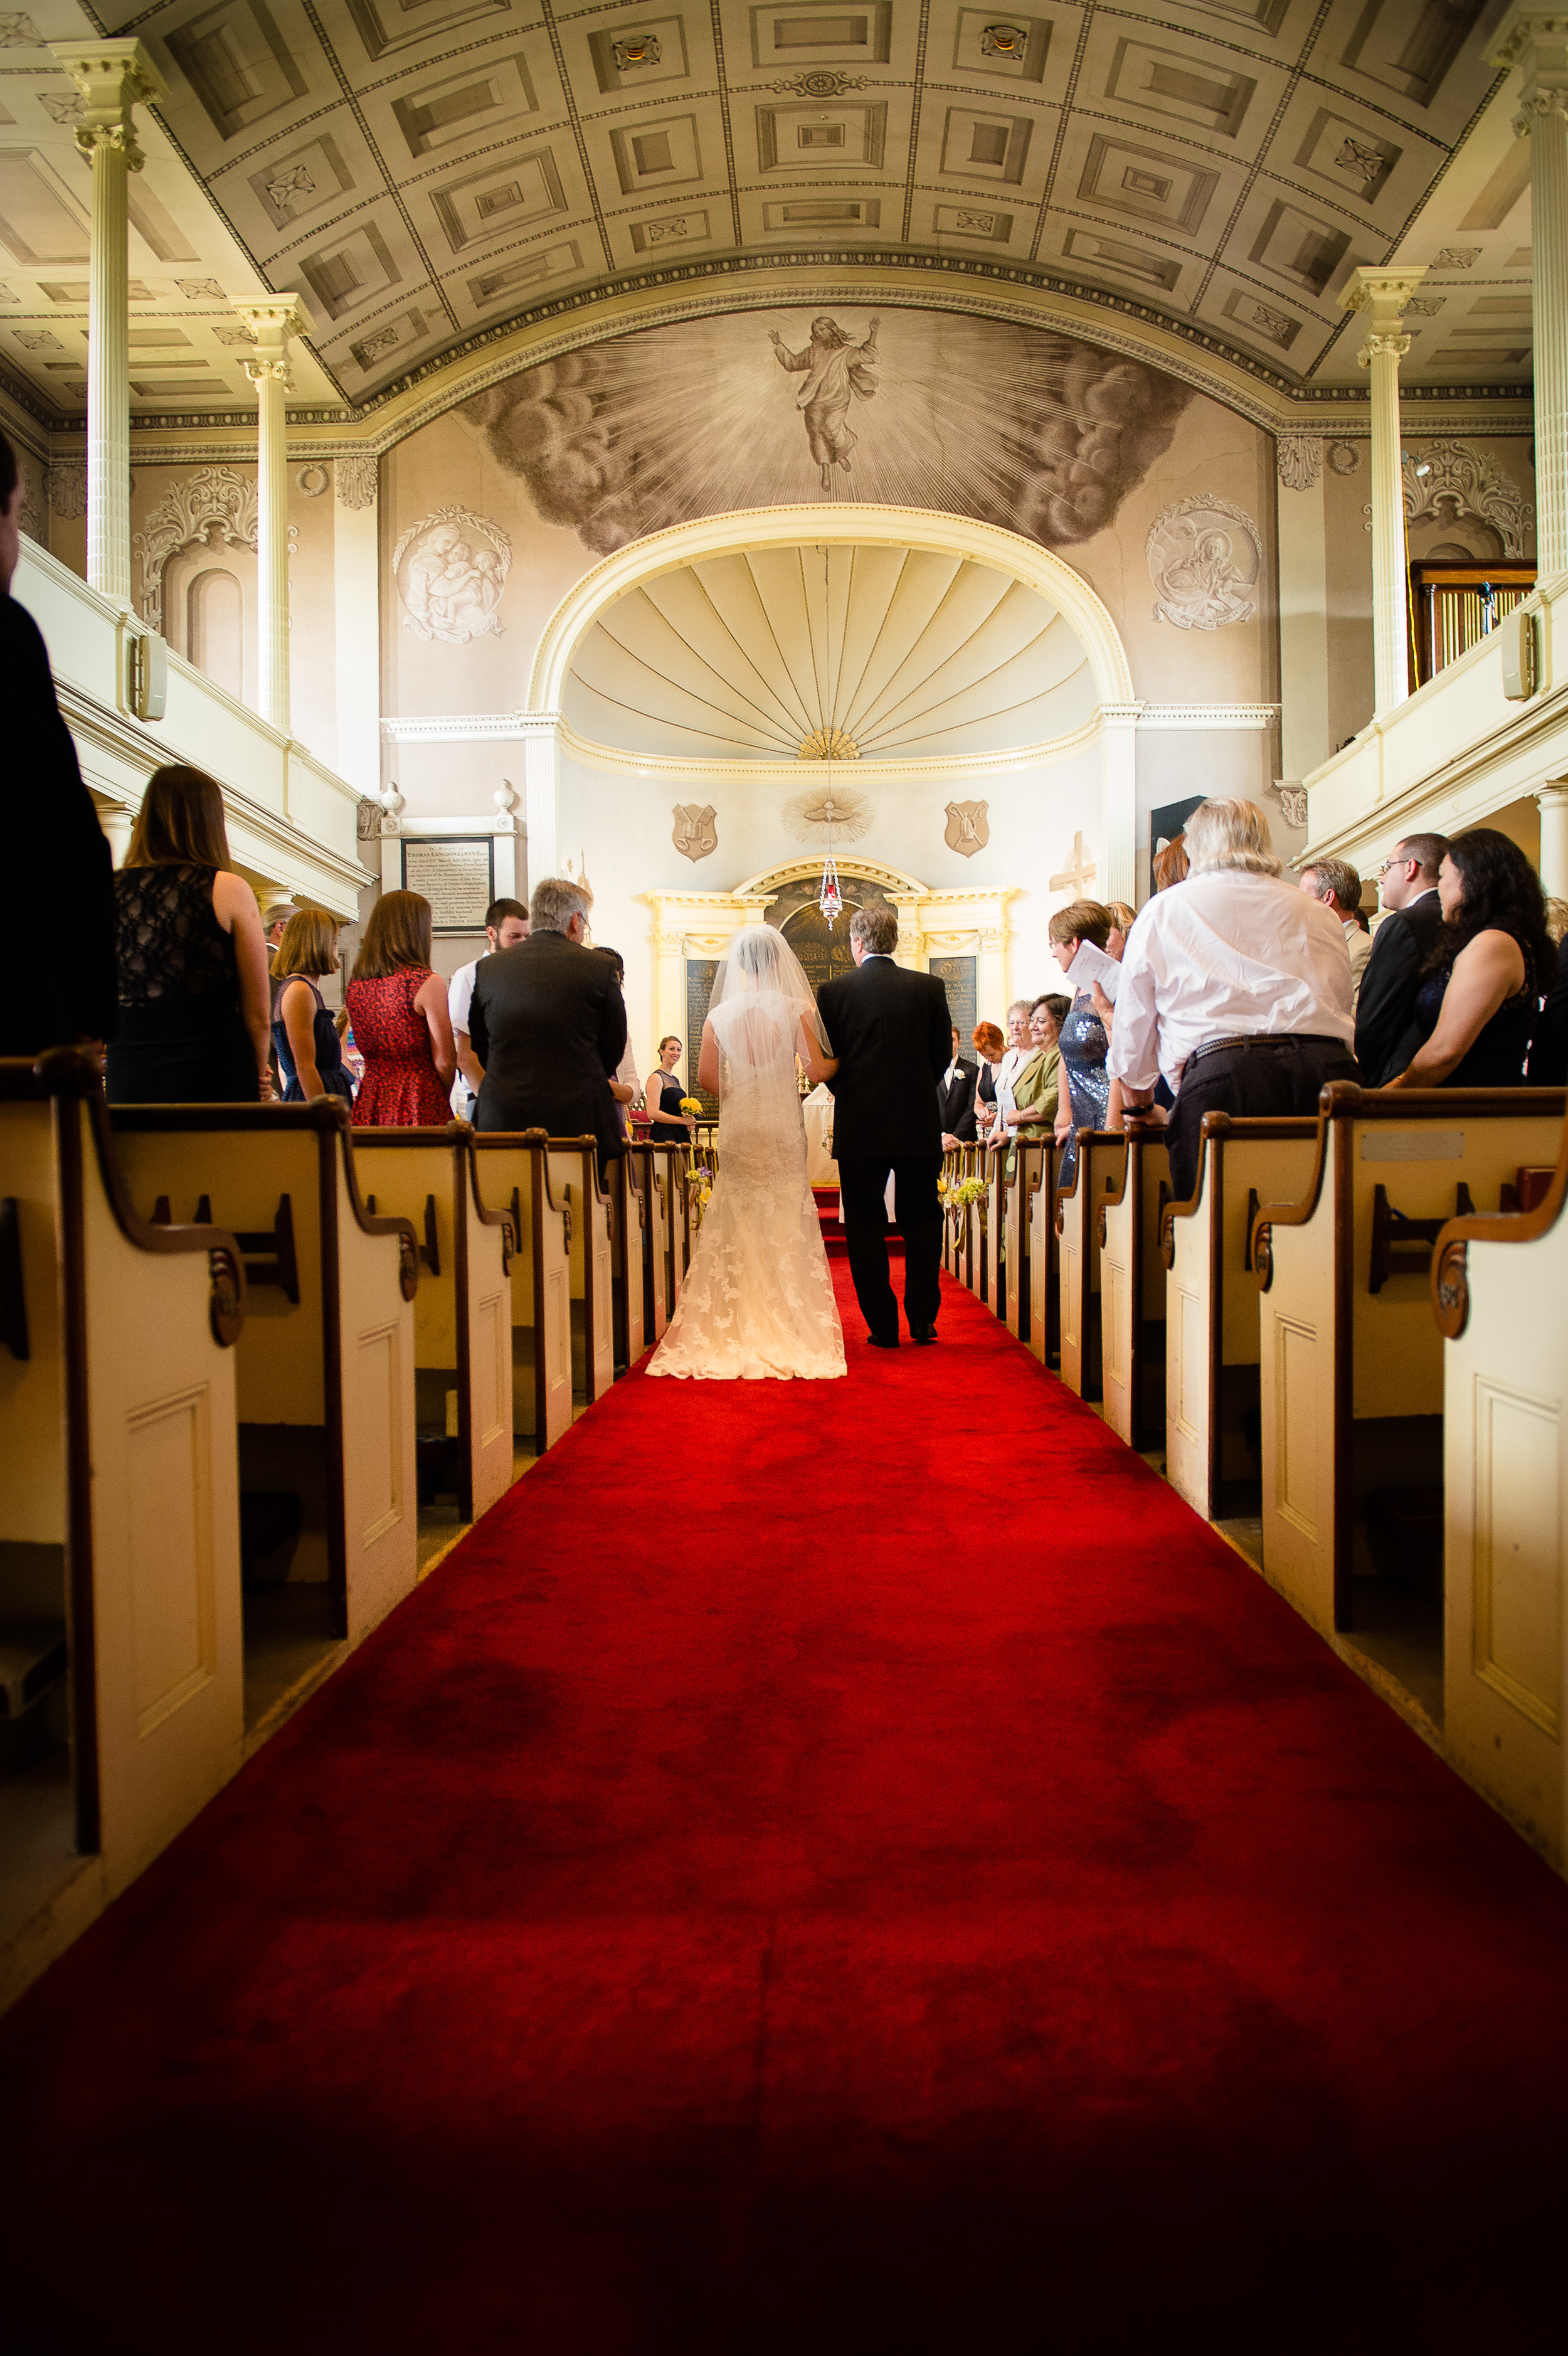 FPO Church wedding.jpg